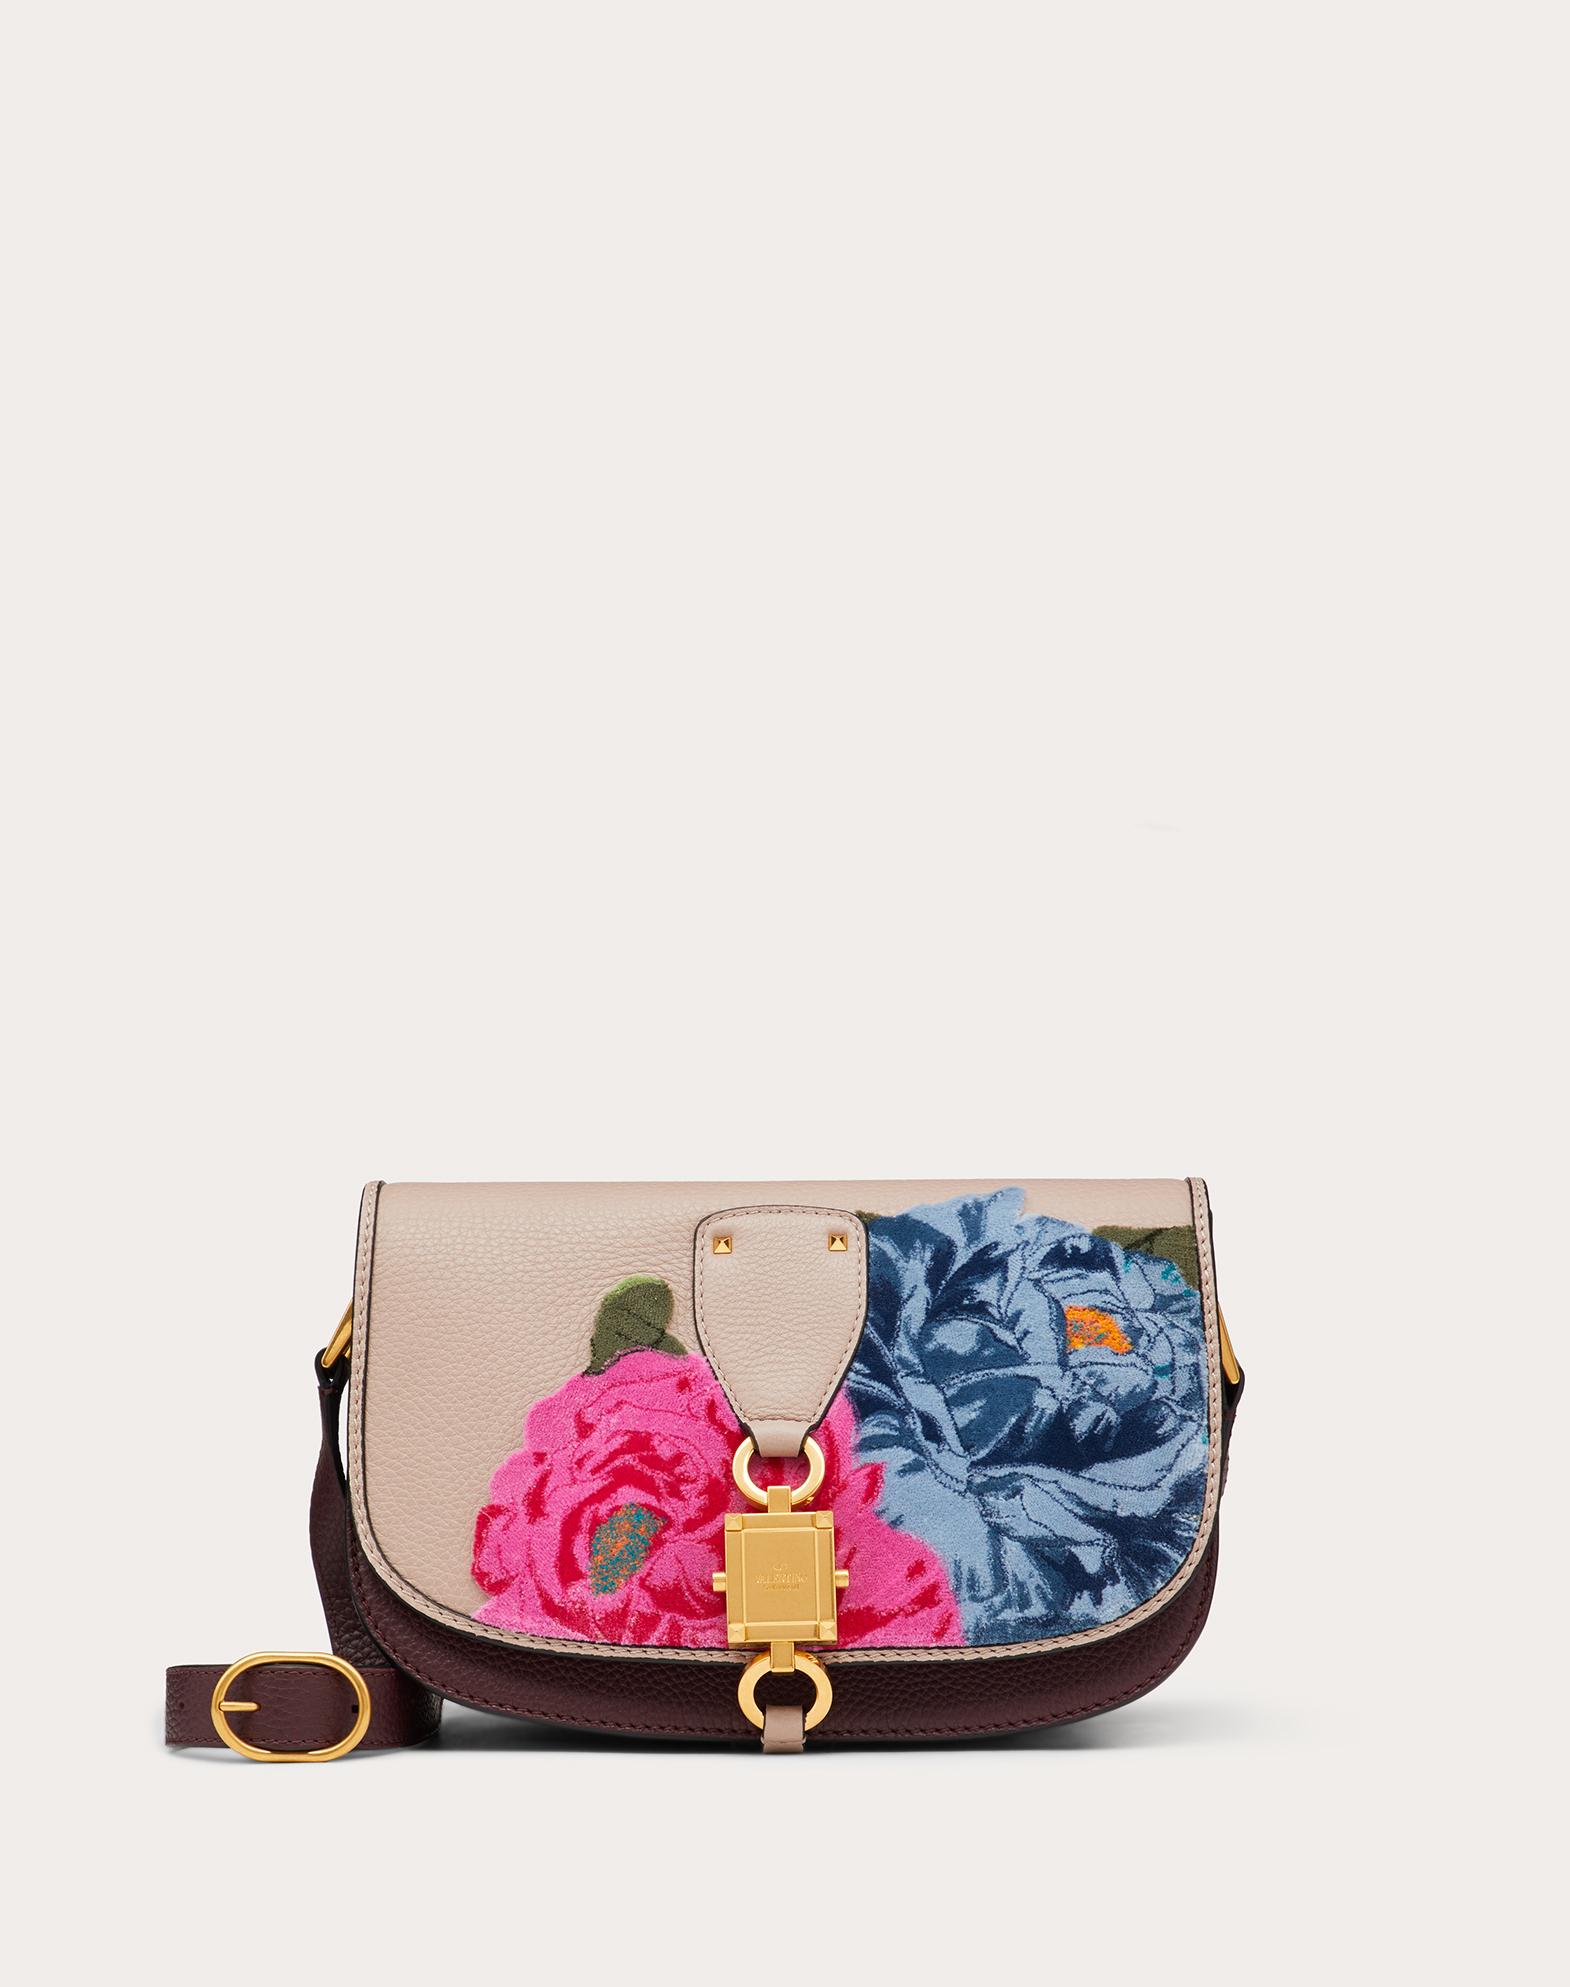 Large VLOCKER Grainy Calfskin Crossbody Bag with Camellia Embroidery